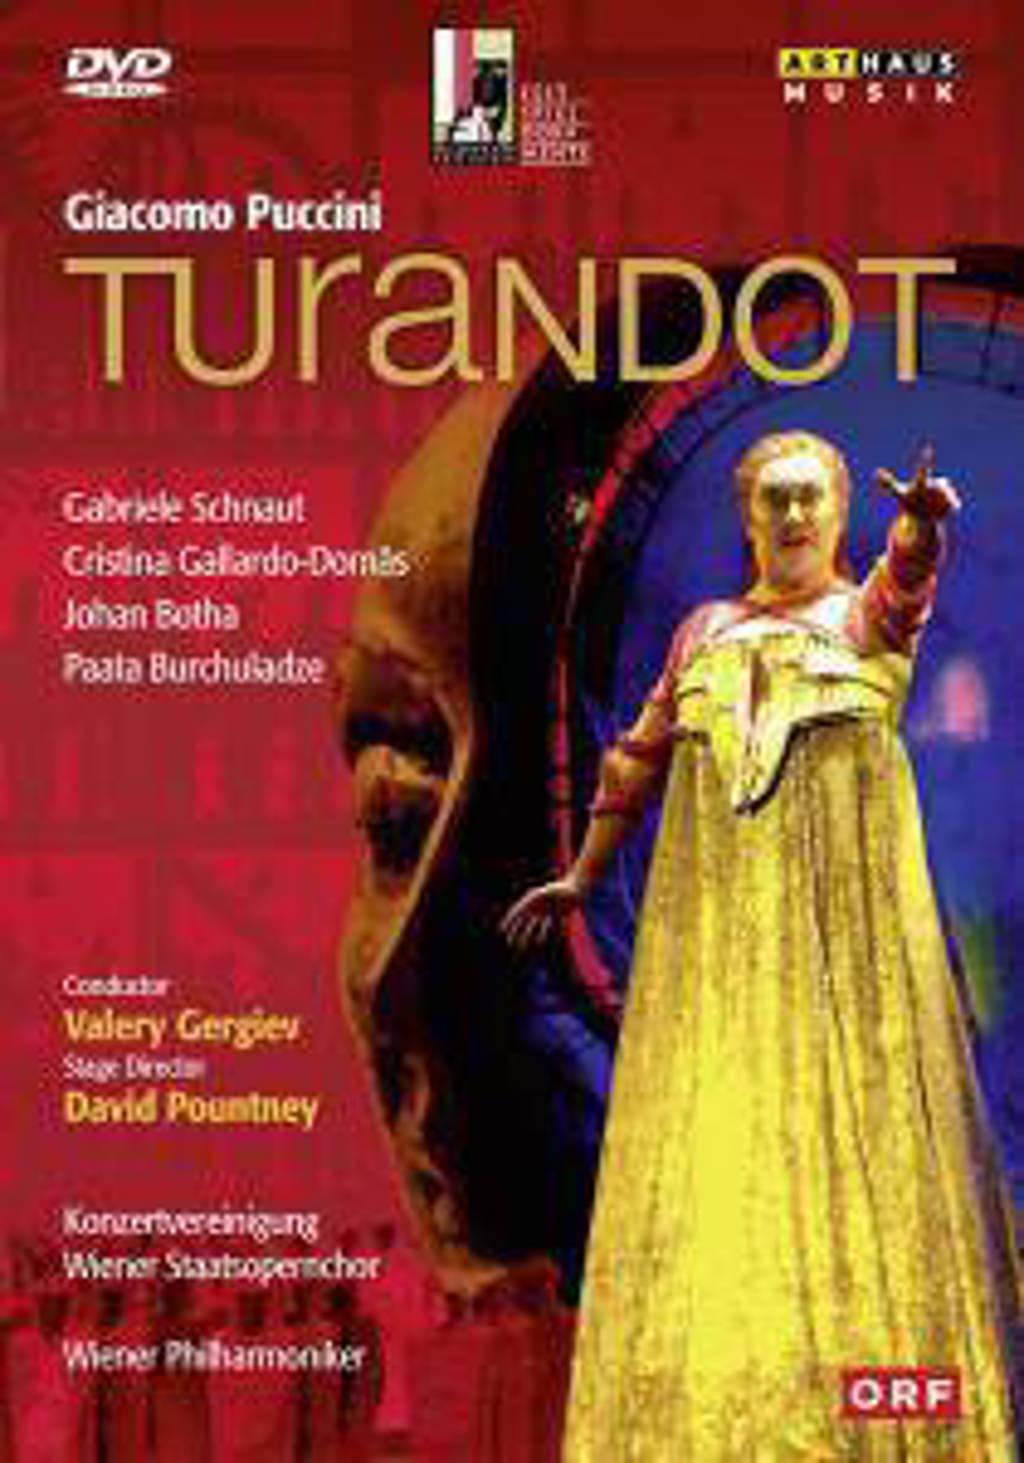 Schnaut, Burchuladze, Botha, Domas - Turandot, Salzburg 2002 (DVD)